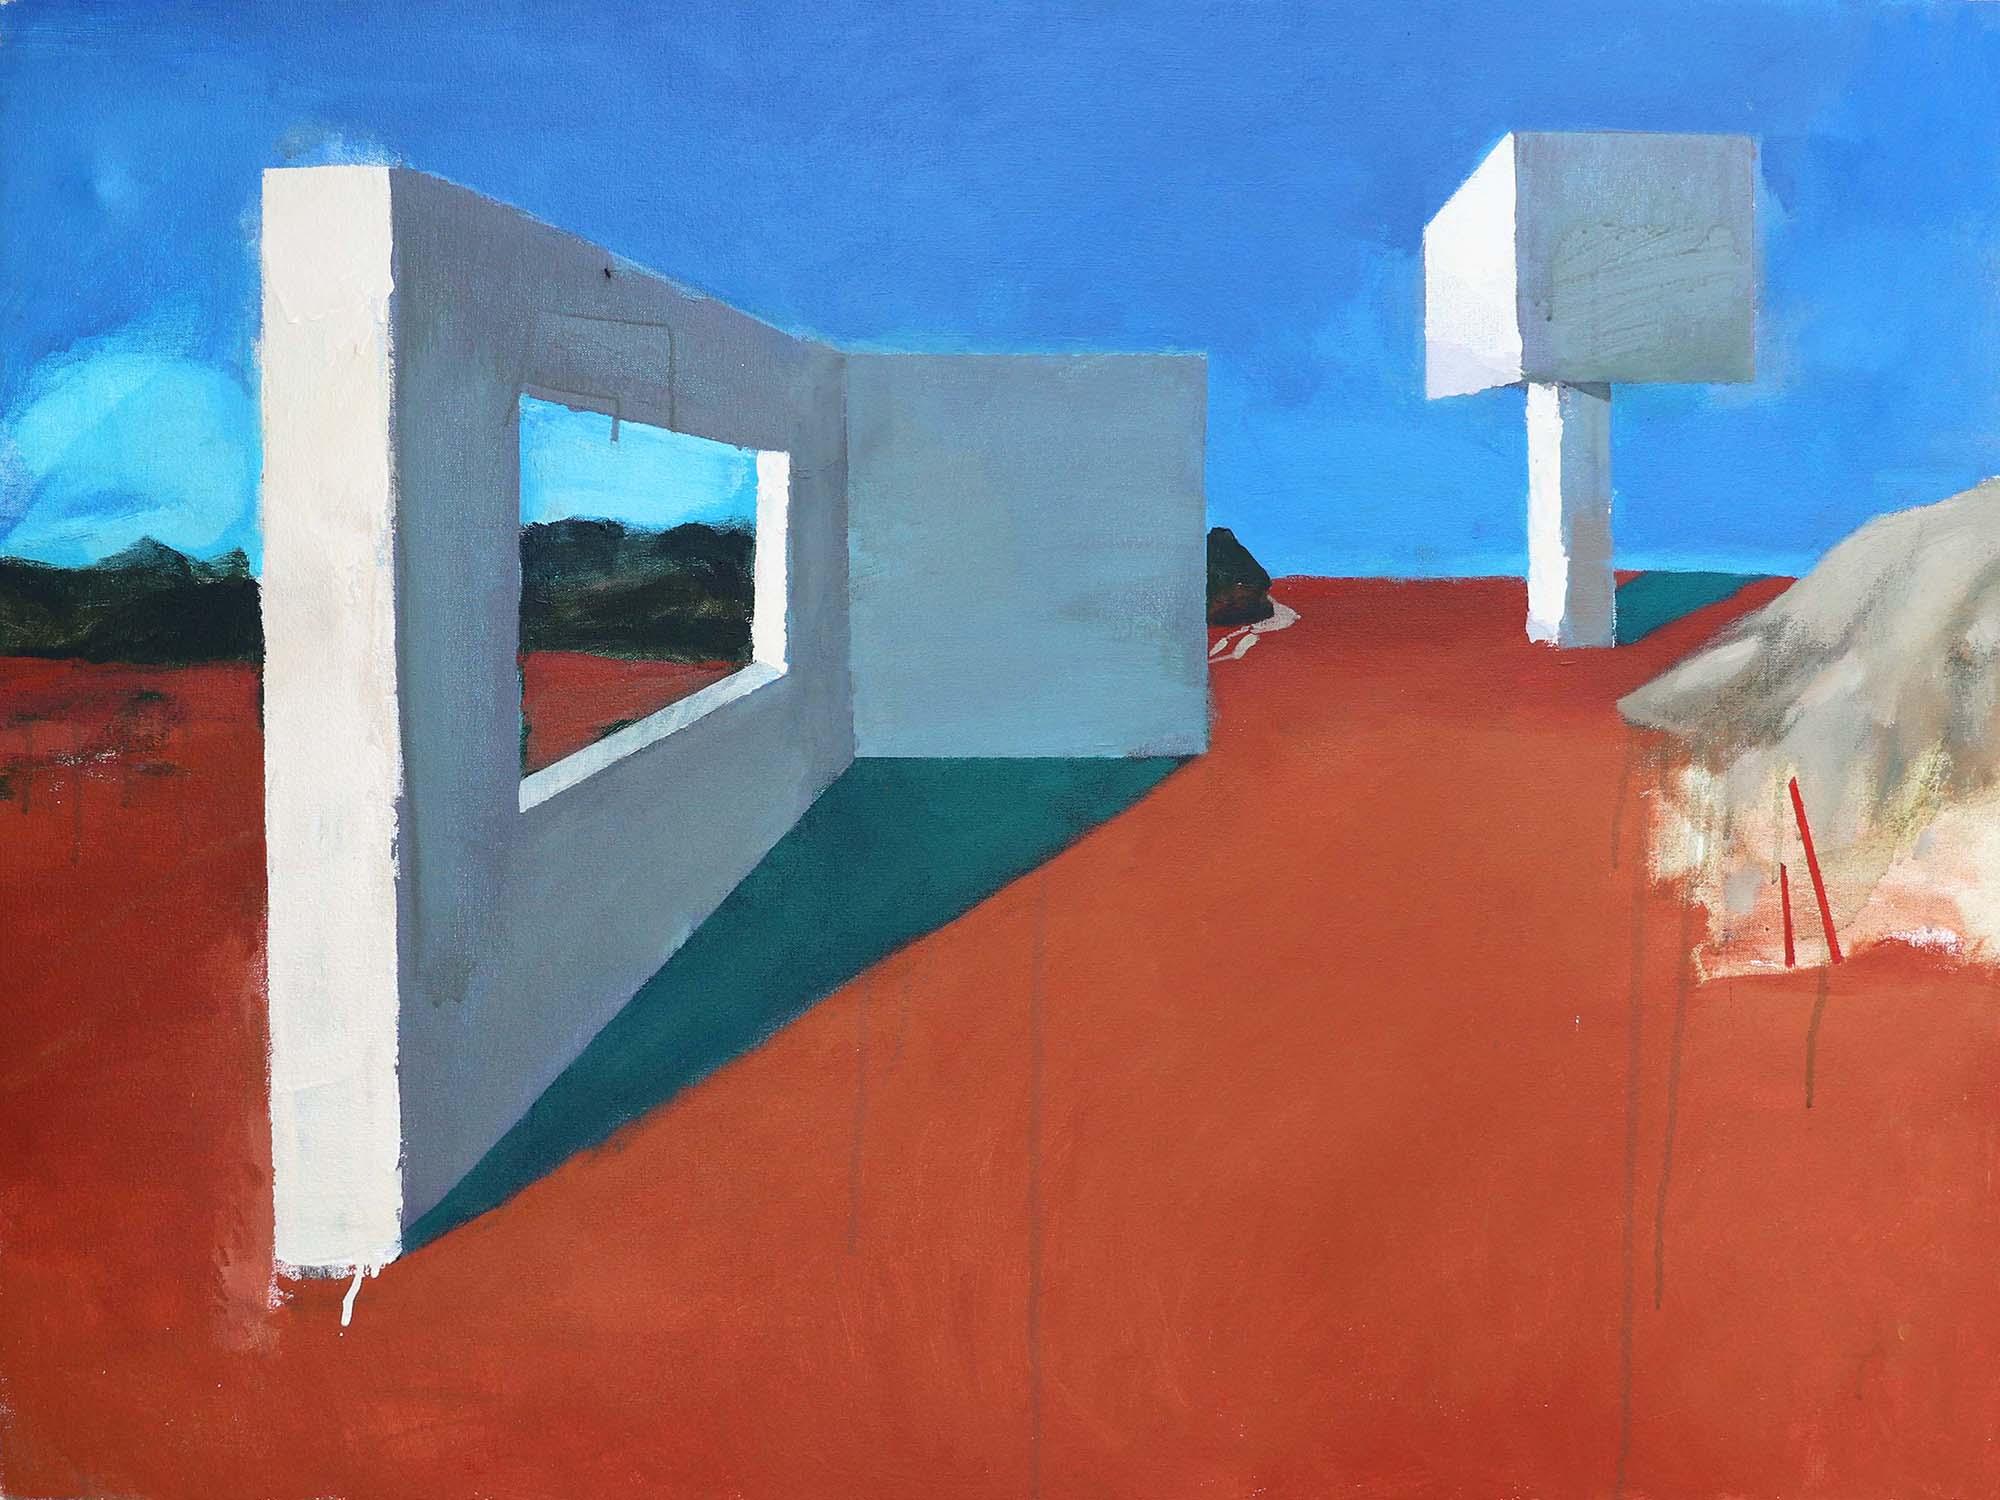 Katerina Buchatska, Hebdomeros had to flee Part 1, Acrylic on canvas, 75 x 100 cm, 2018